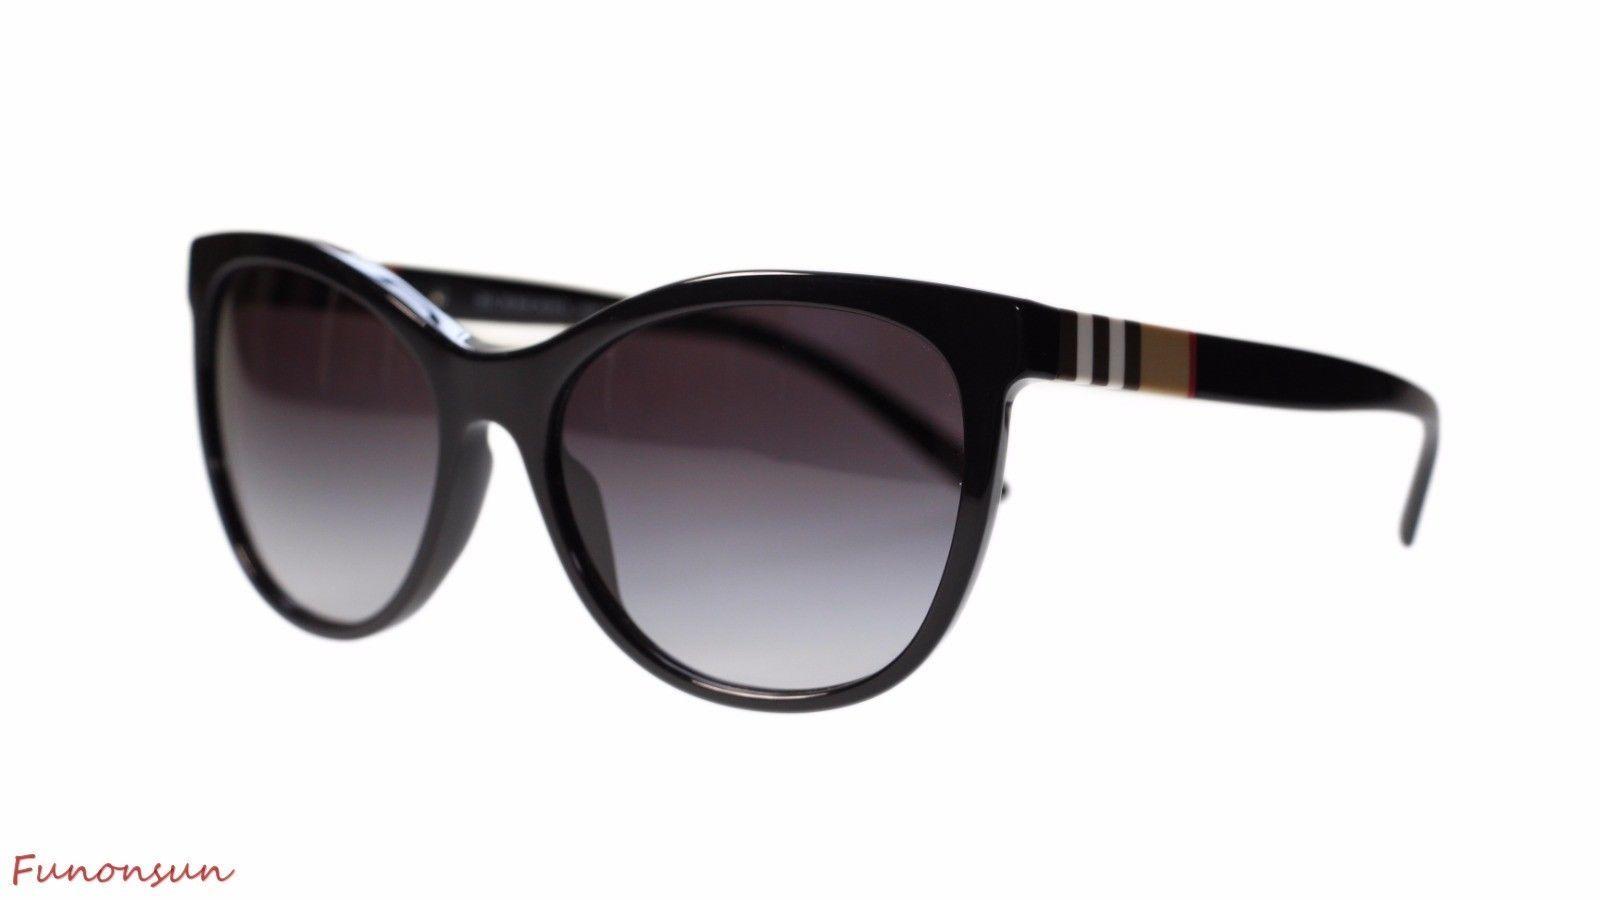 e0180954fa29 Burberry Women s Sunglasses BE4199 30018G and 50 similar items. S l1600